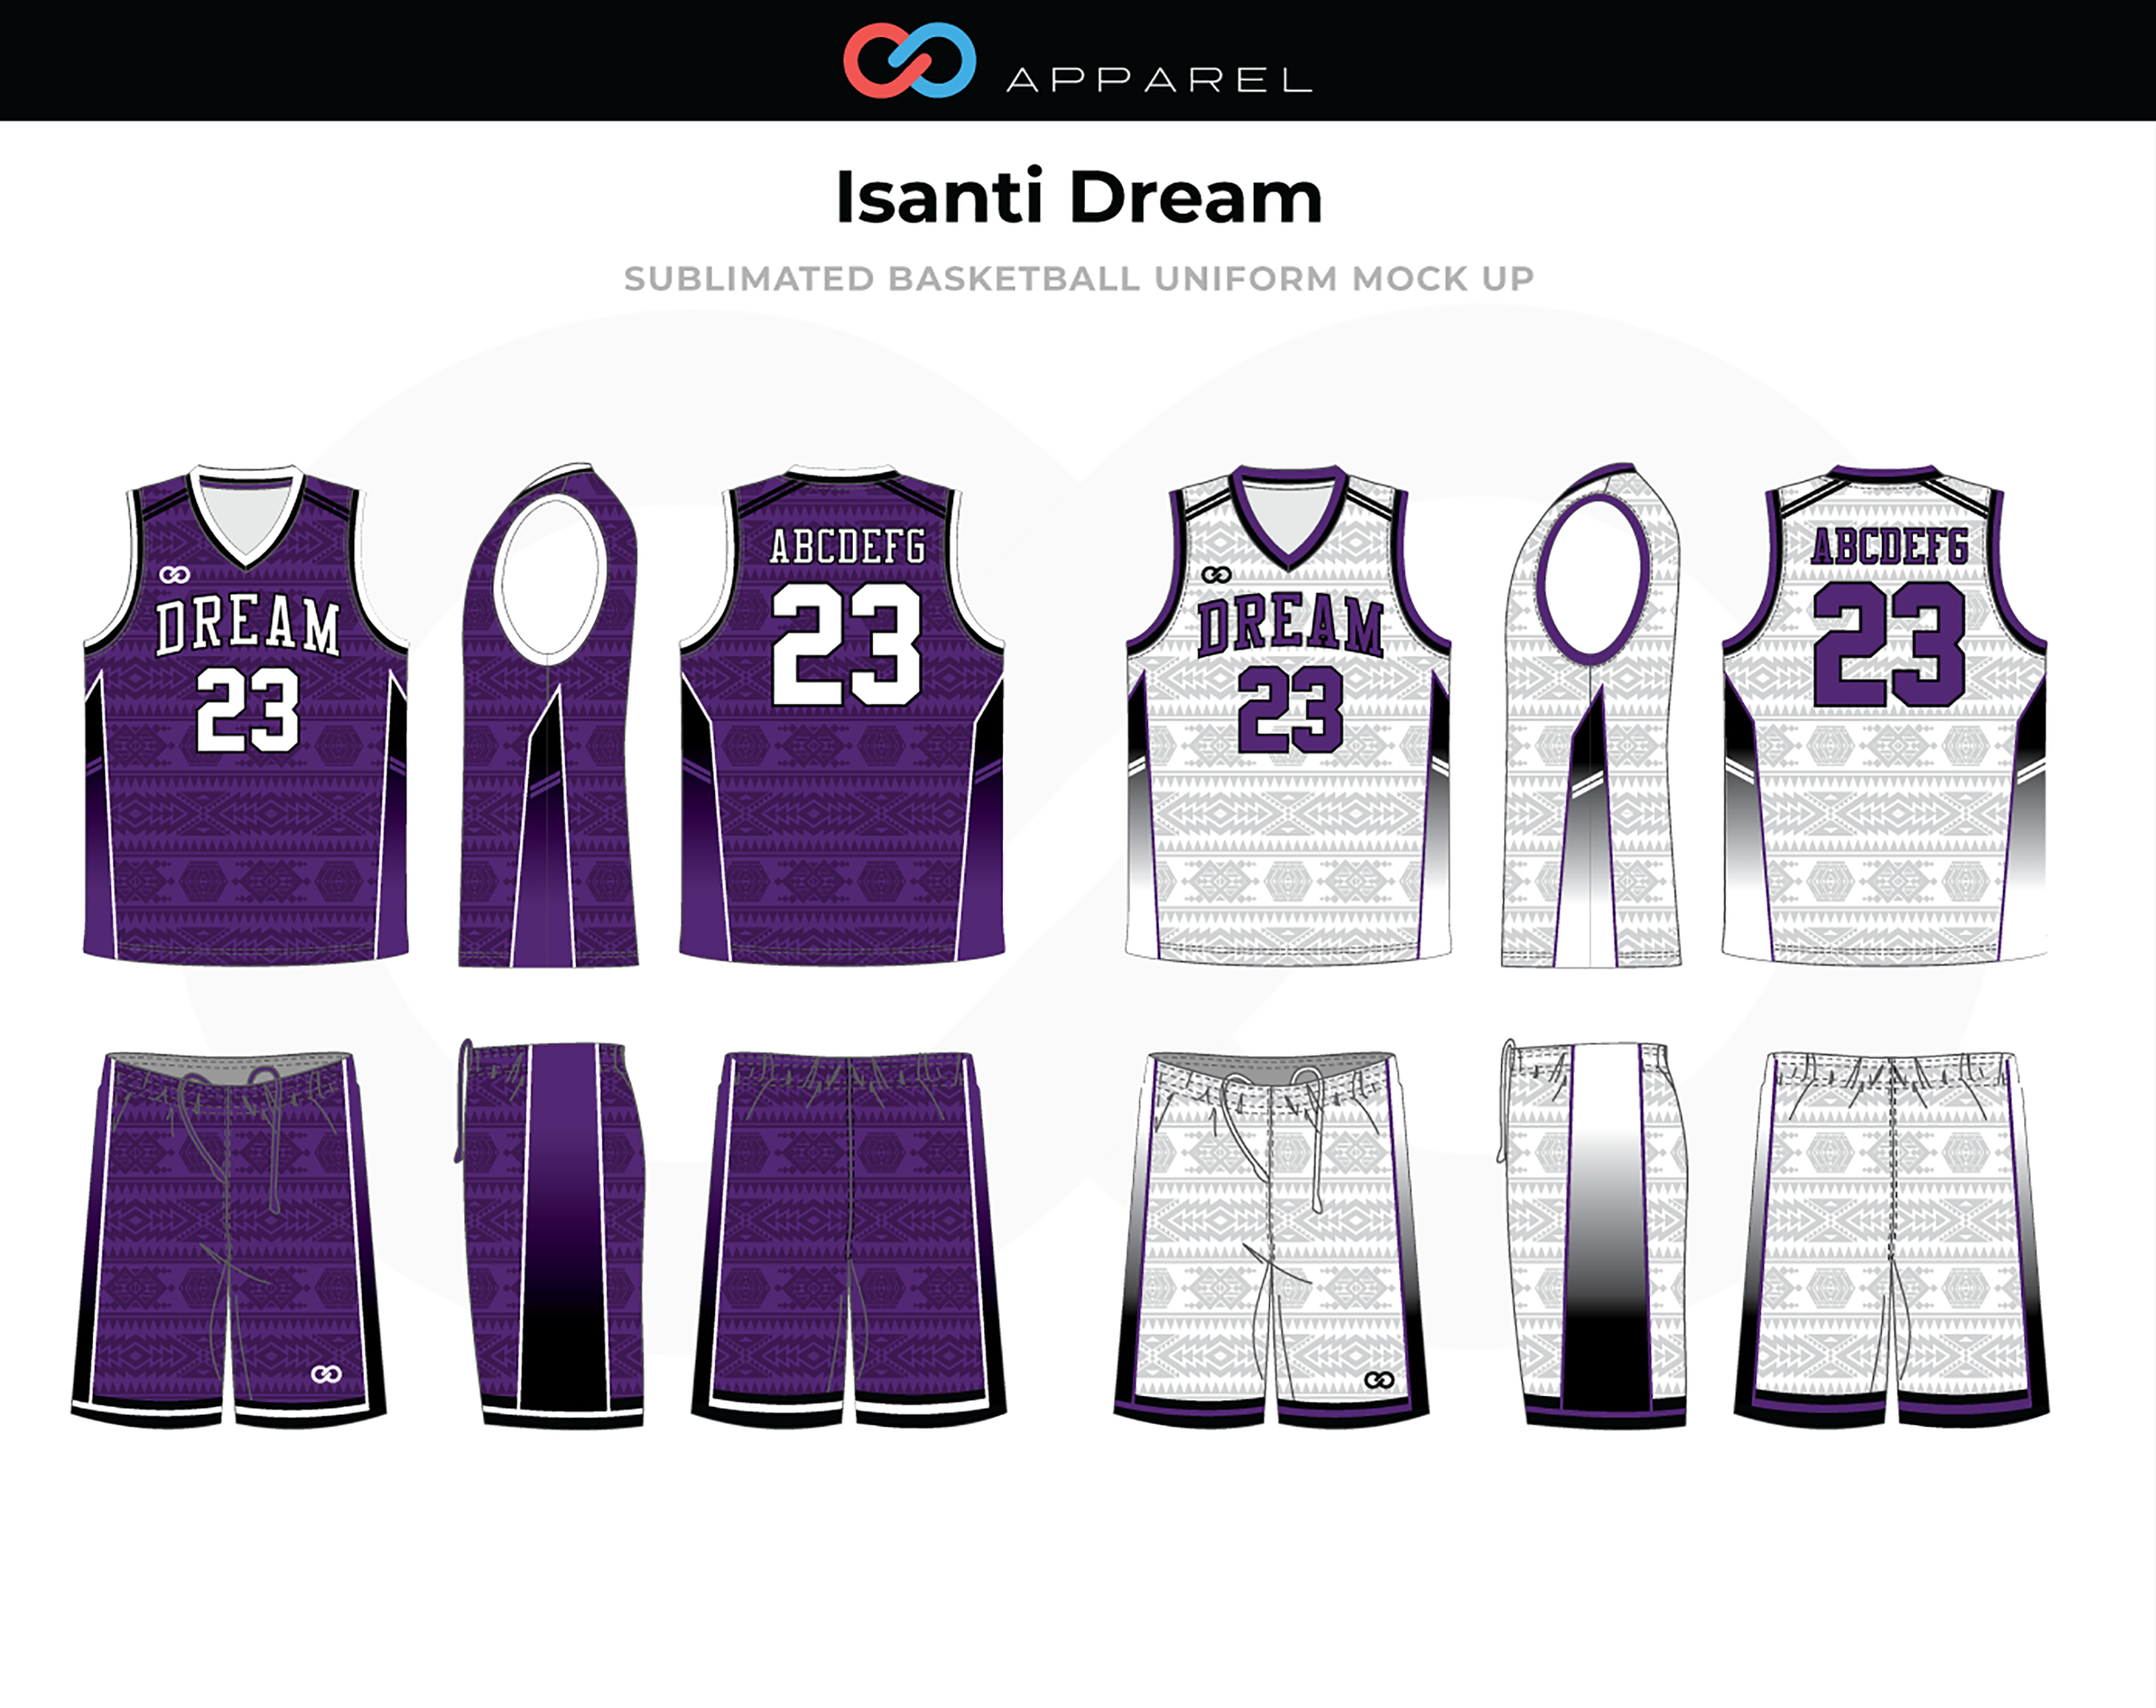 Isanti-Dream-Sublimated-Basketball-Uniform-Mock-Up.png